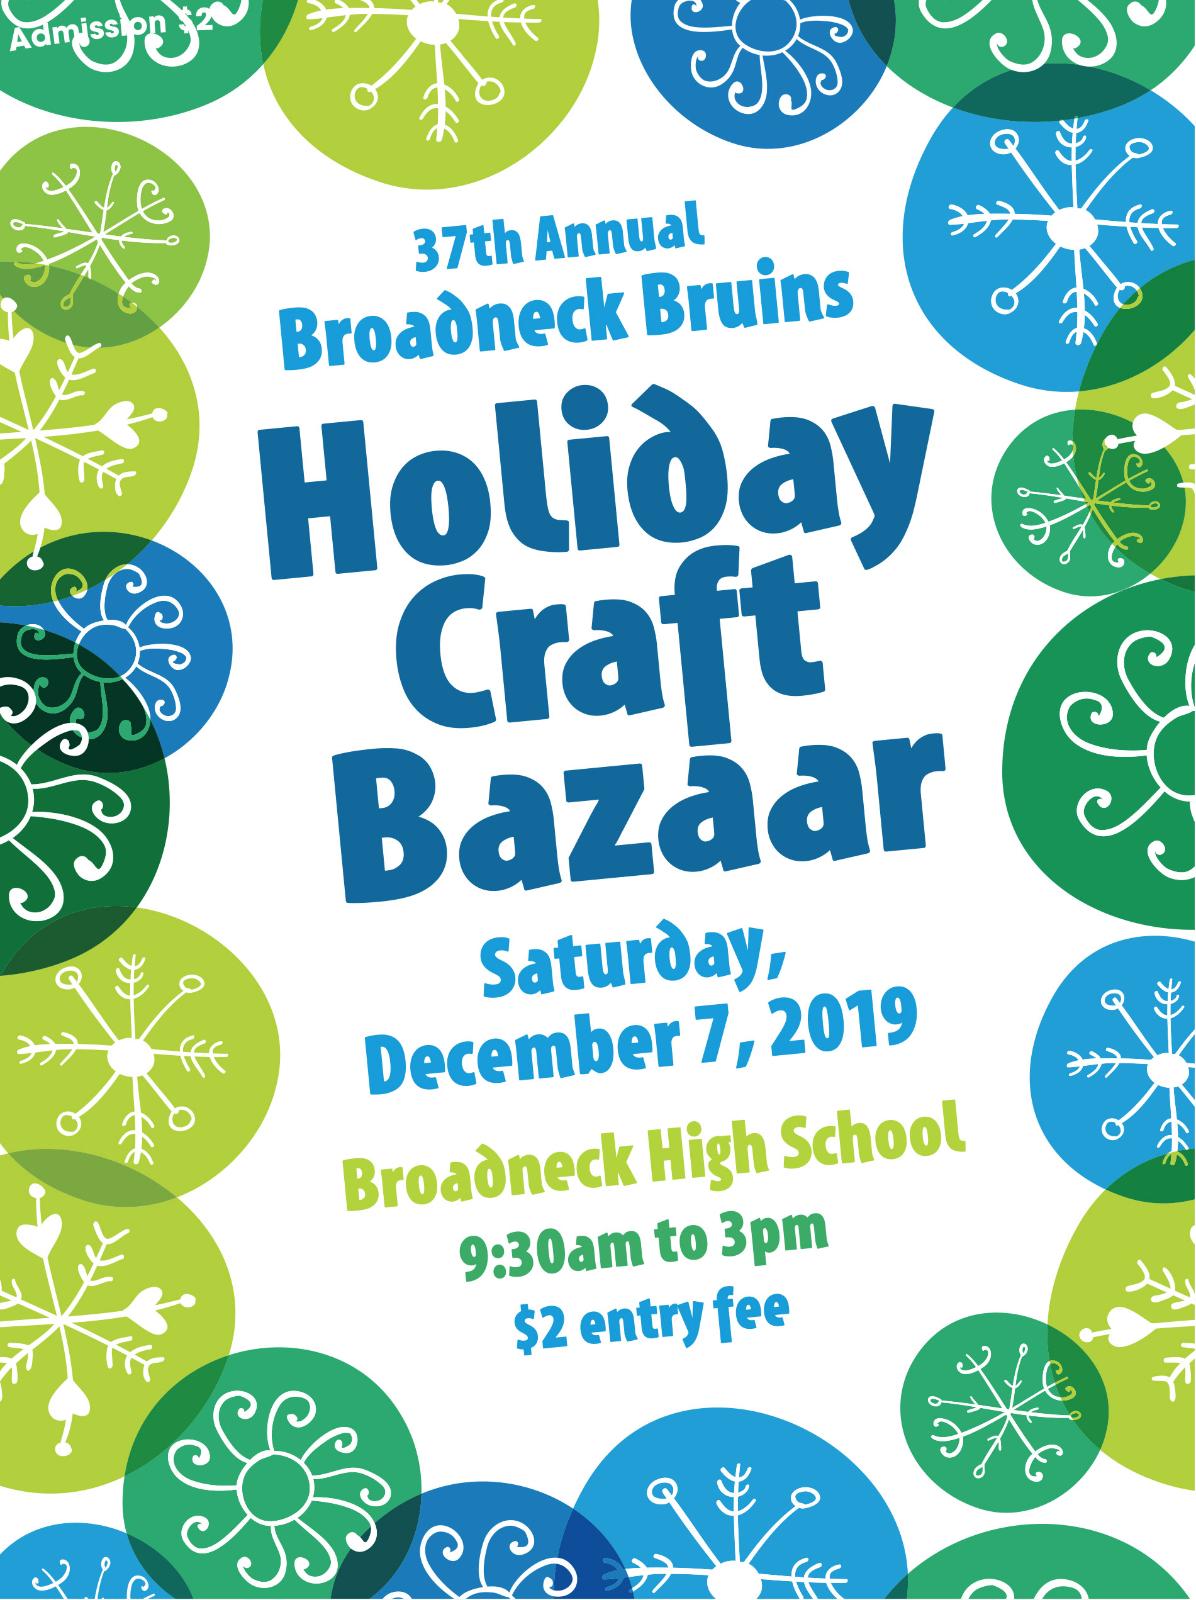 Bruin's Holiday Craft Bazaar – WE NEED YOU!